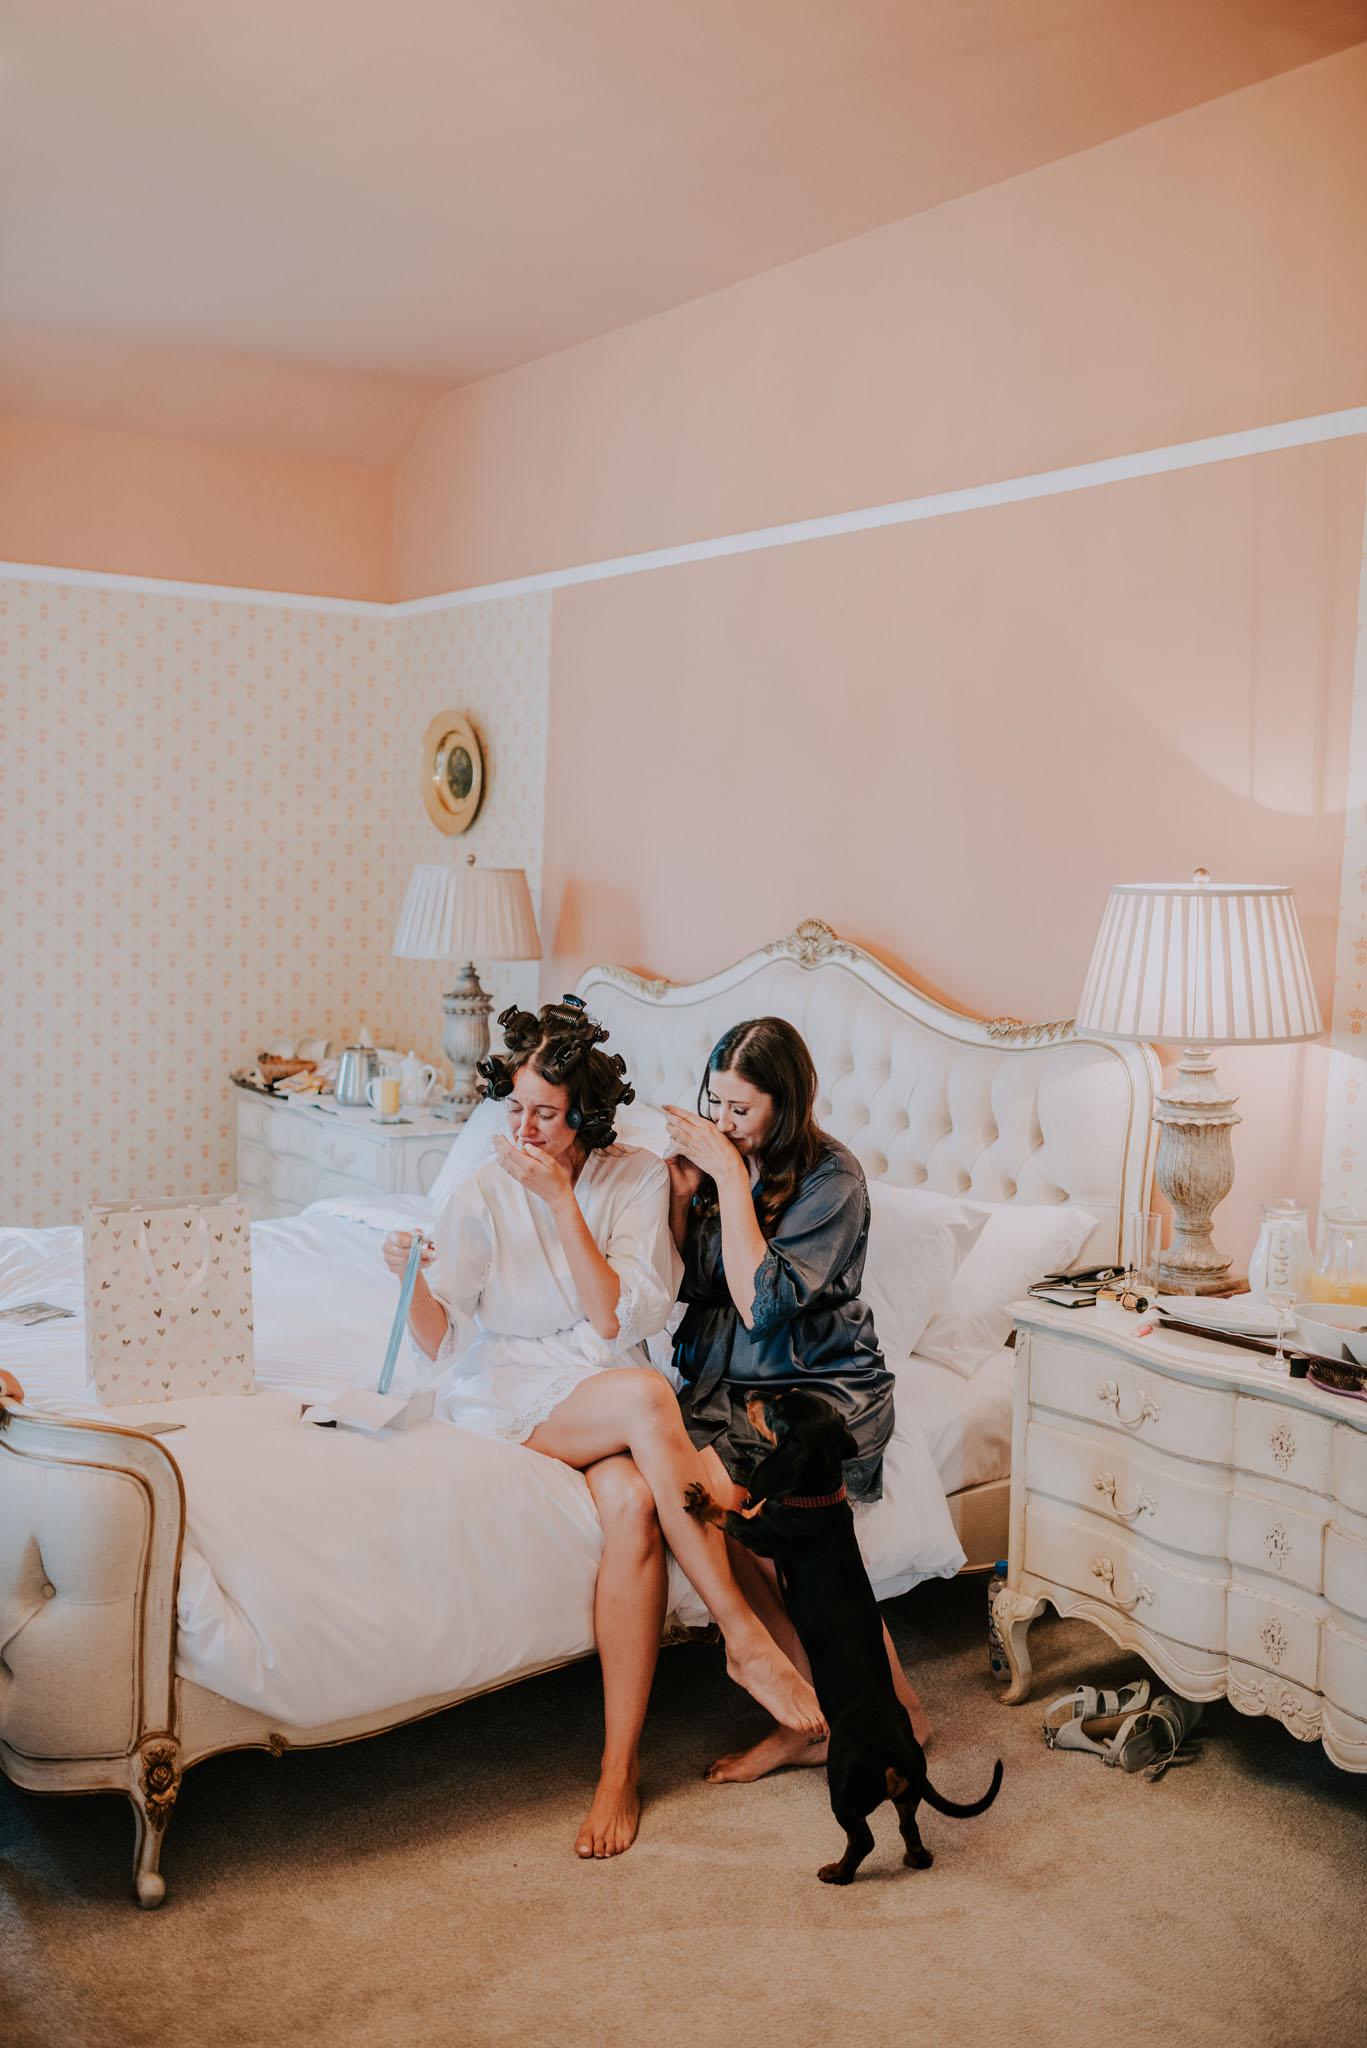 wedding-photographer-glewstone-court-hereford-scott-stockwell-photography052.jpg